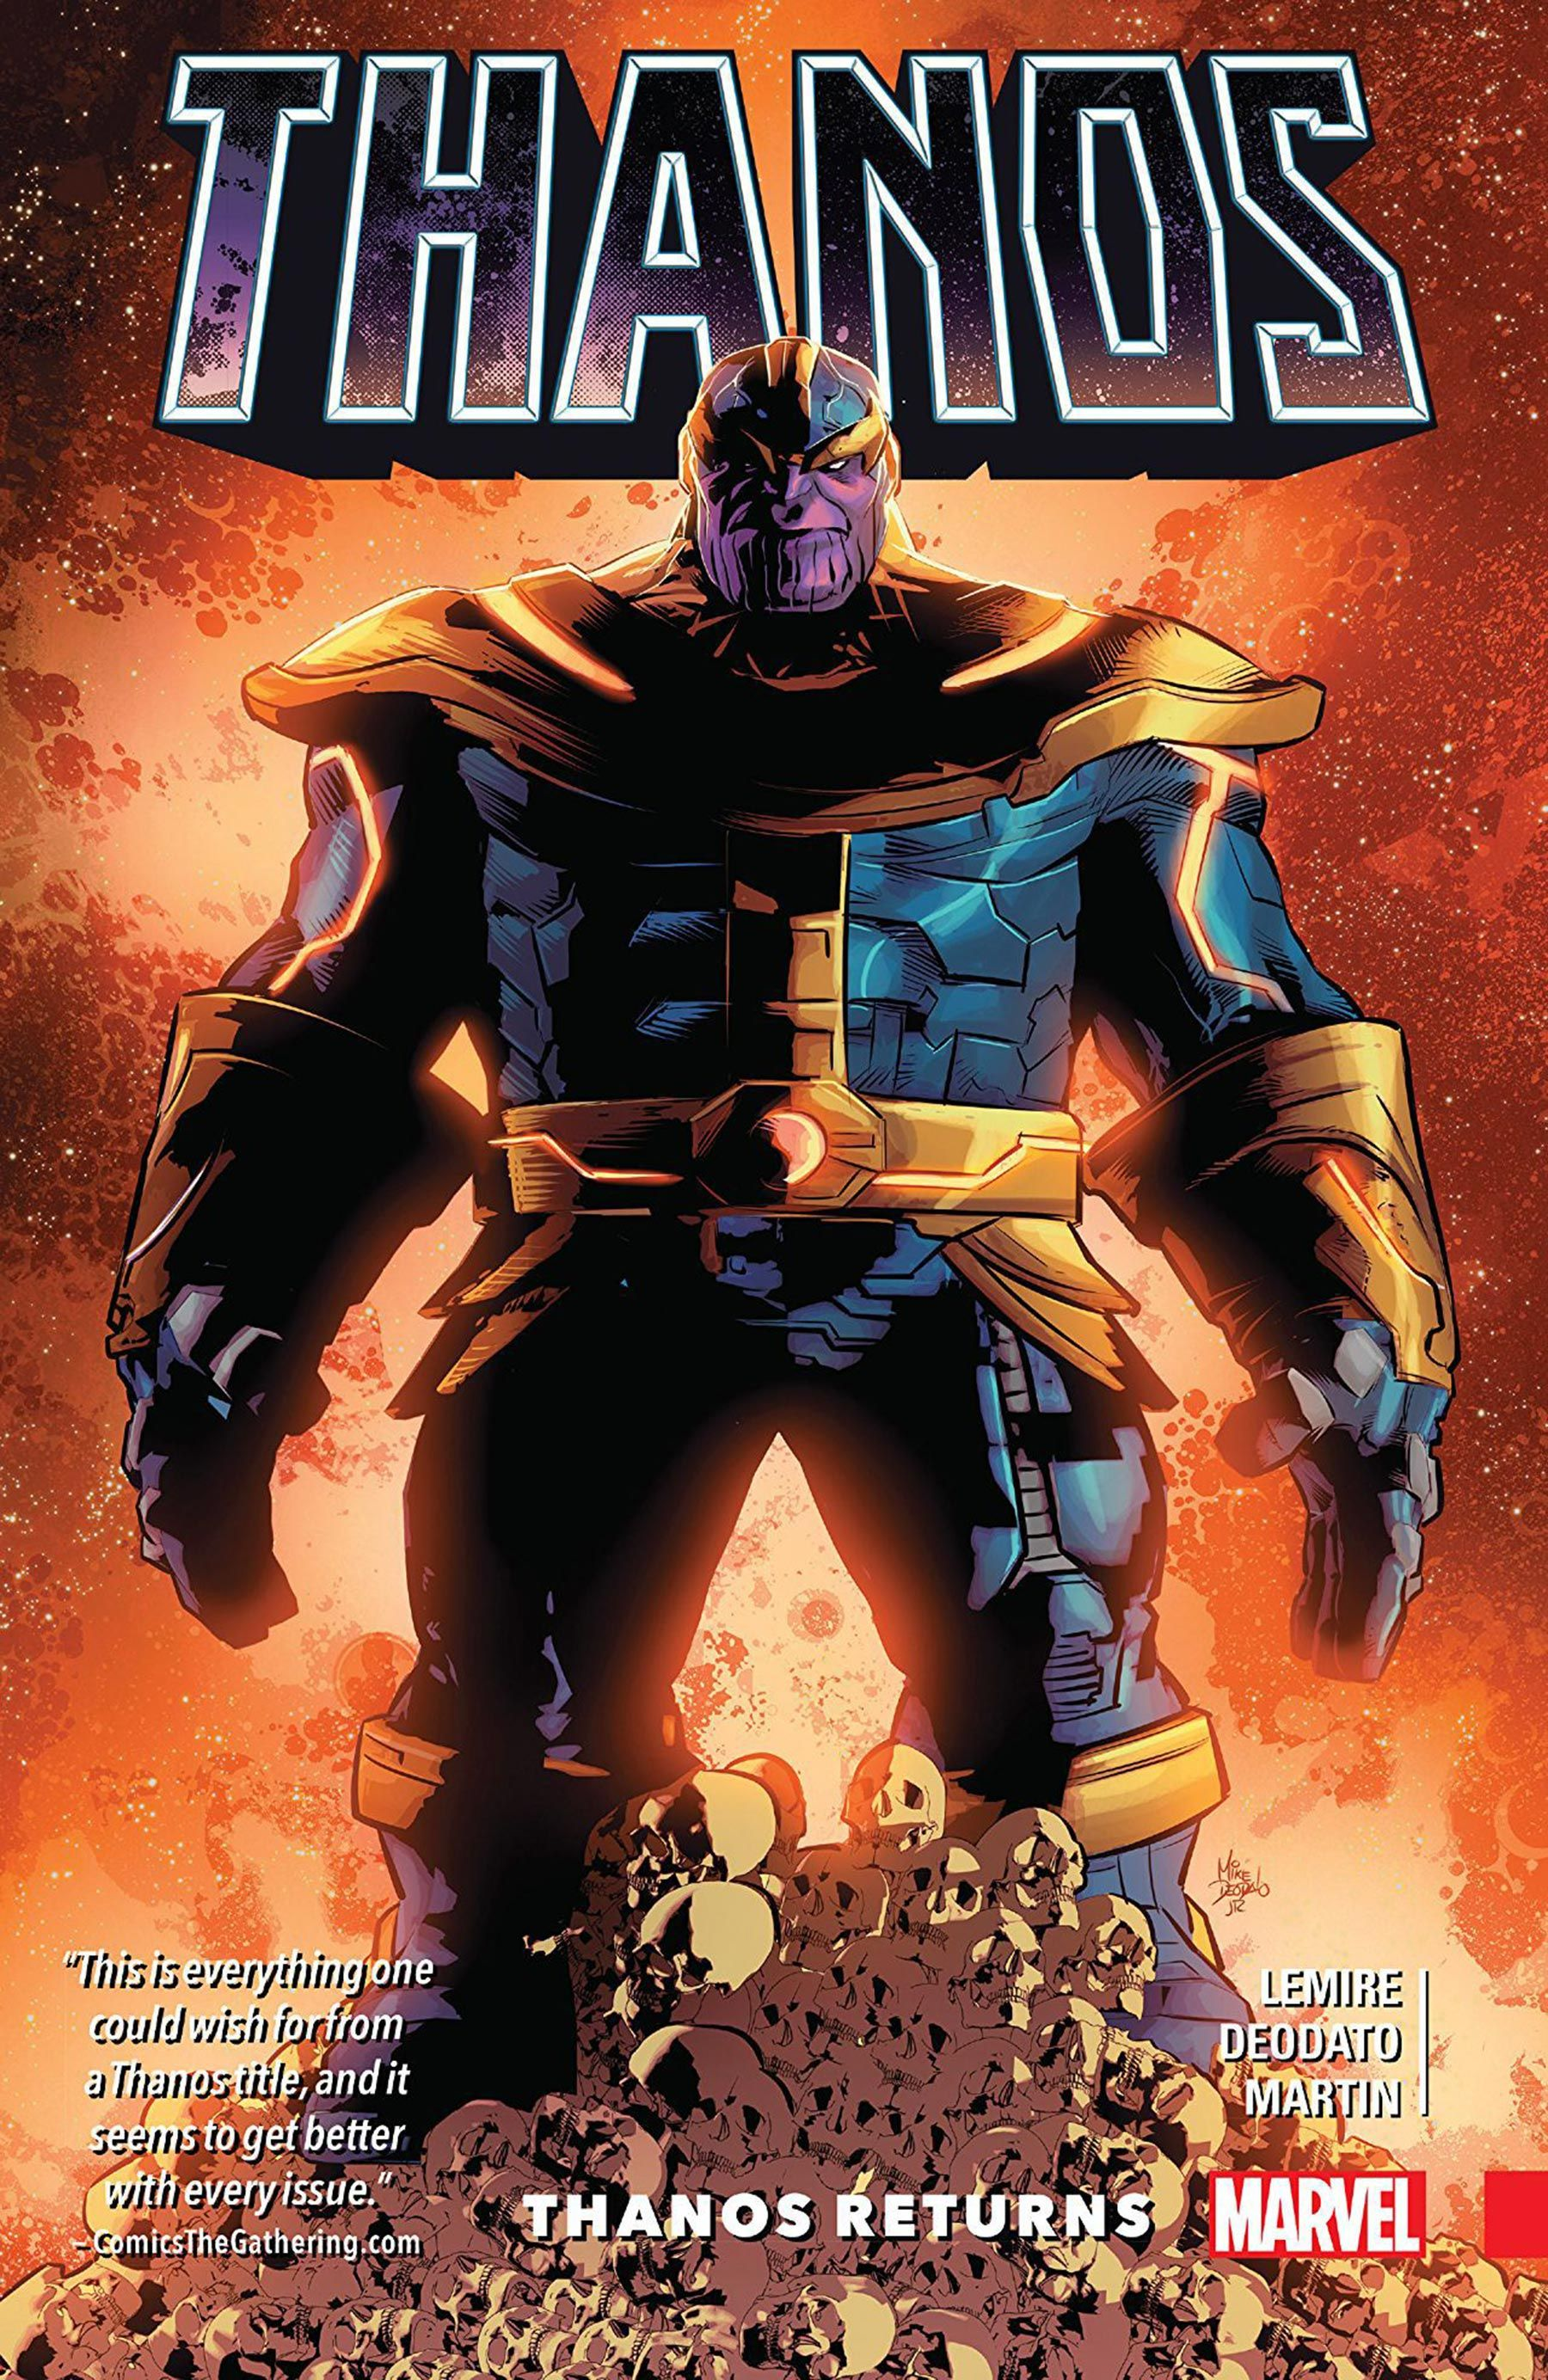 Josh Brolin Signed Thanos Avengers Titan Hero Series Toy Endgame Deadpool Coa Durable Service Television